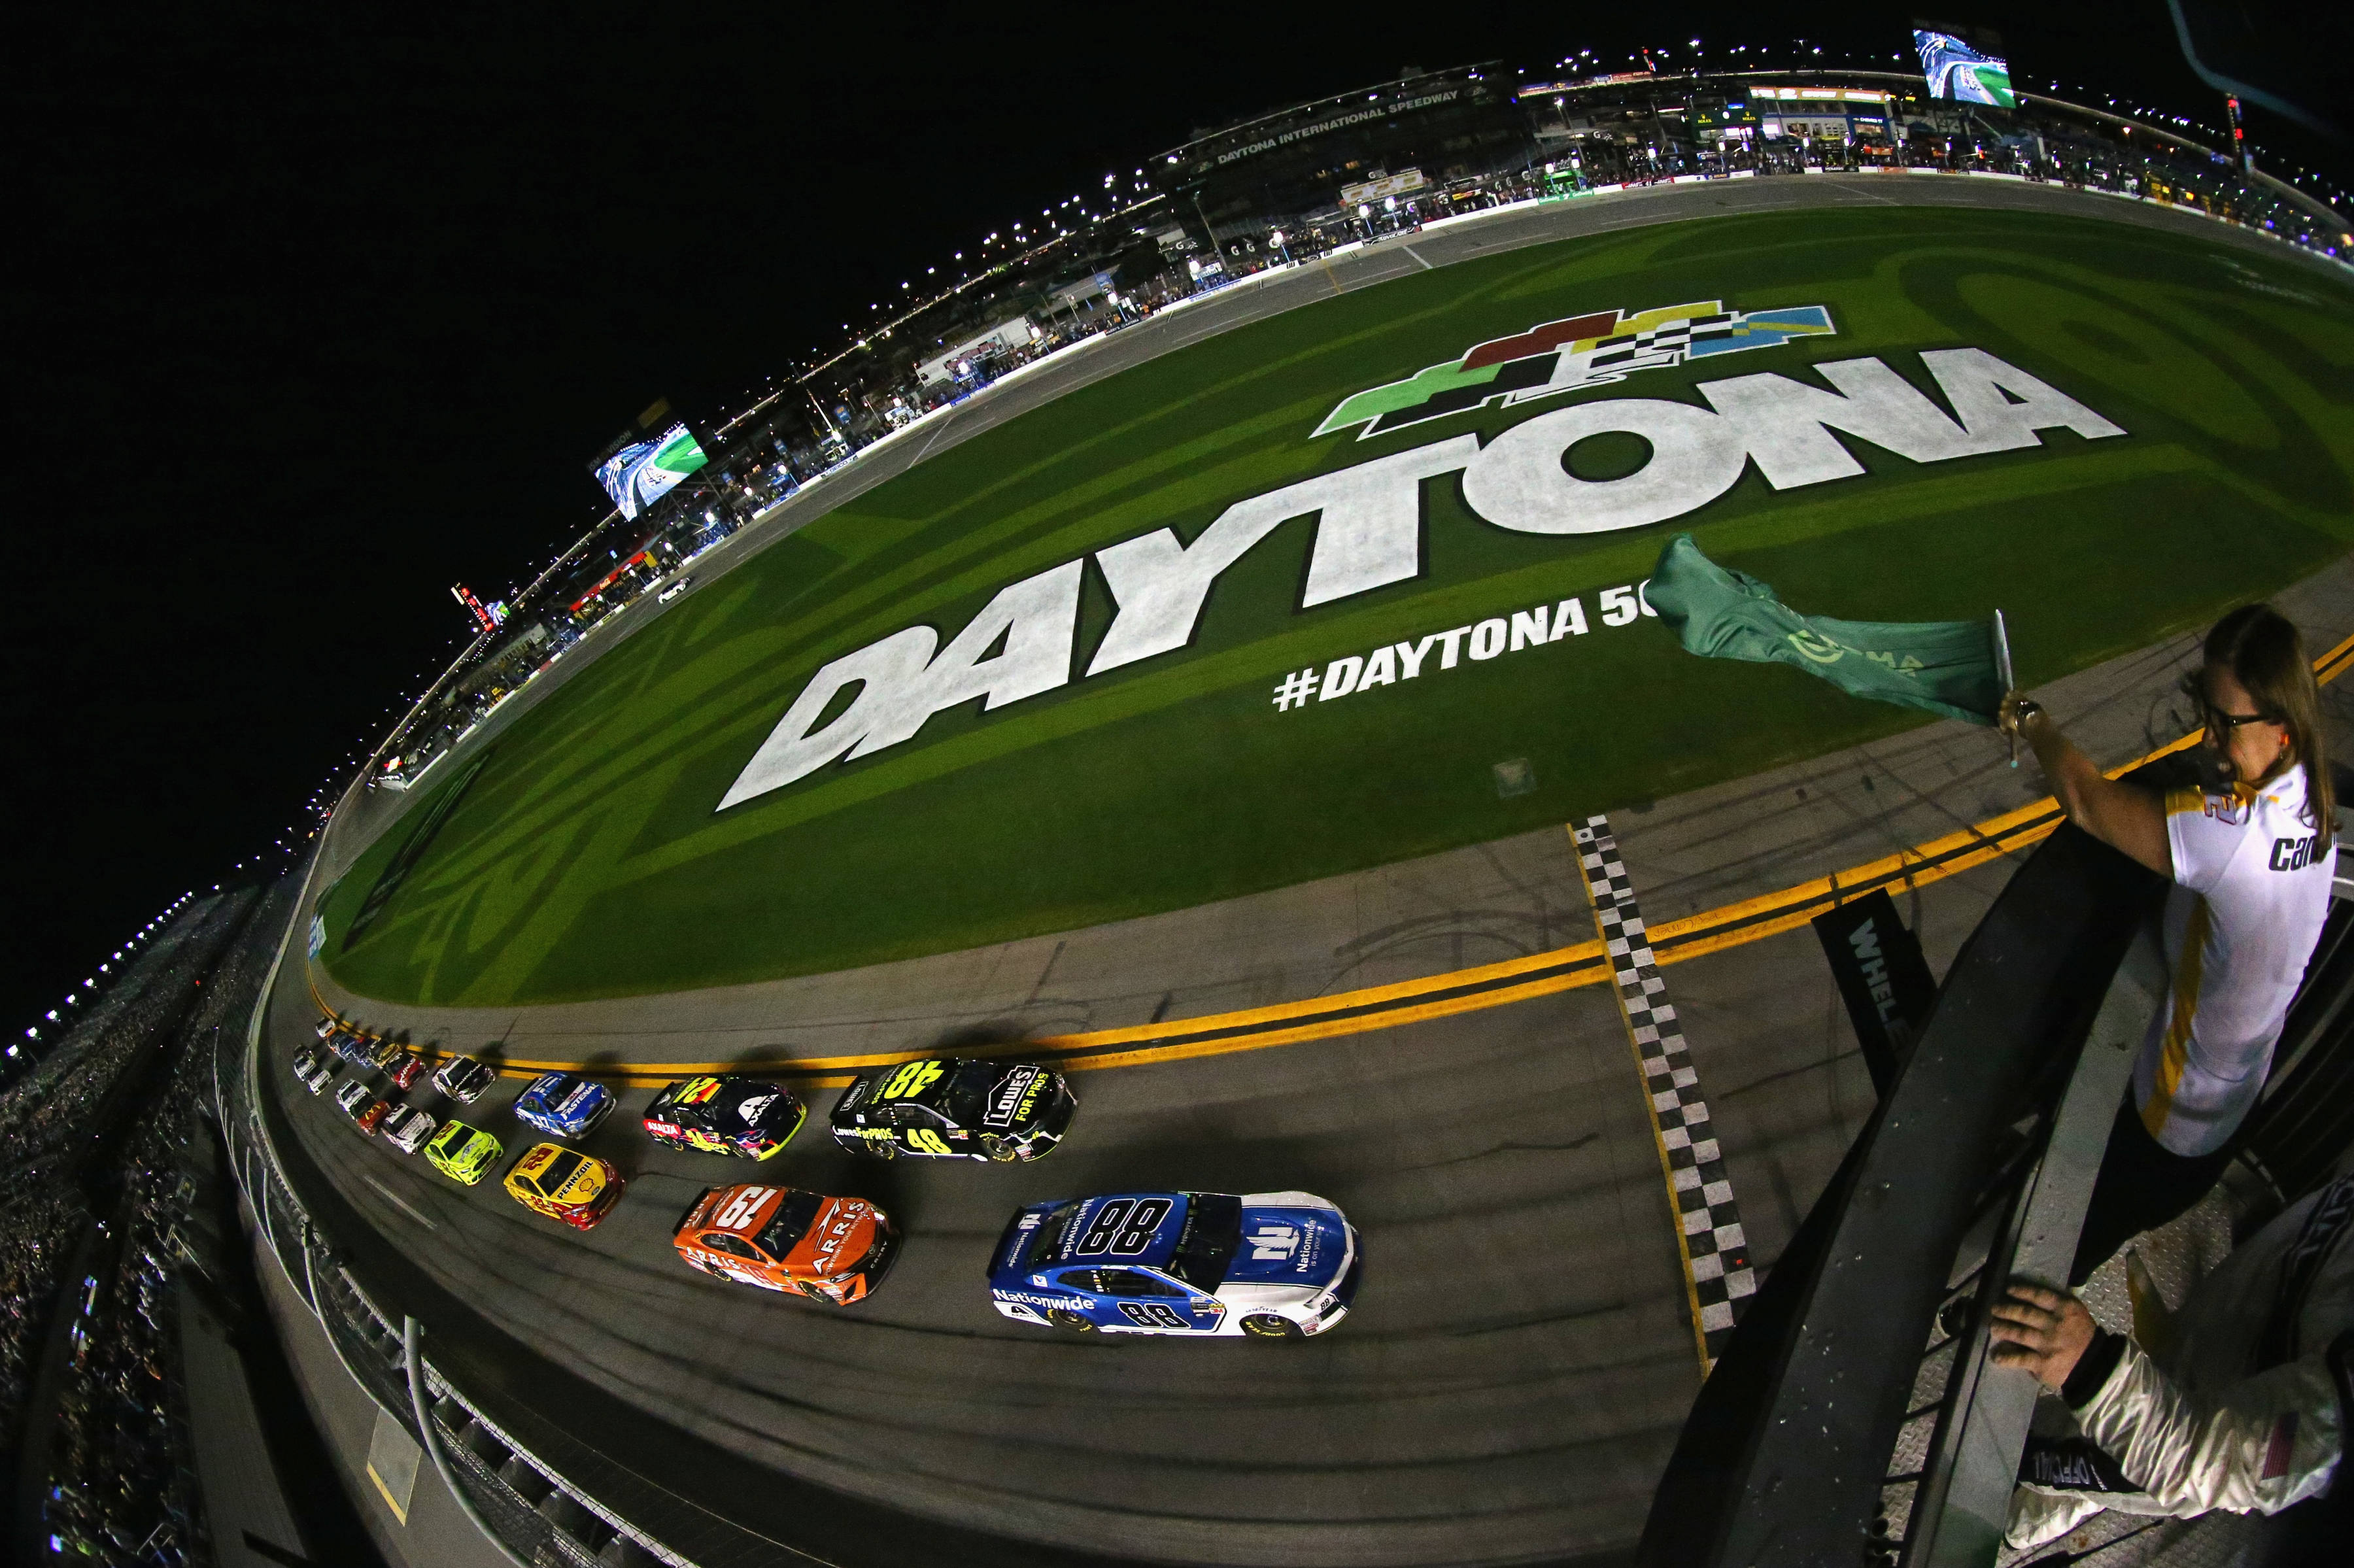 Daytona Duels - Alex Bowman and Jimmie Johnson